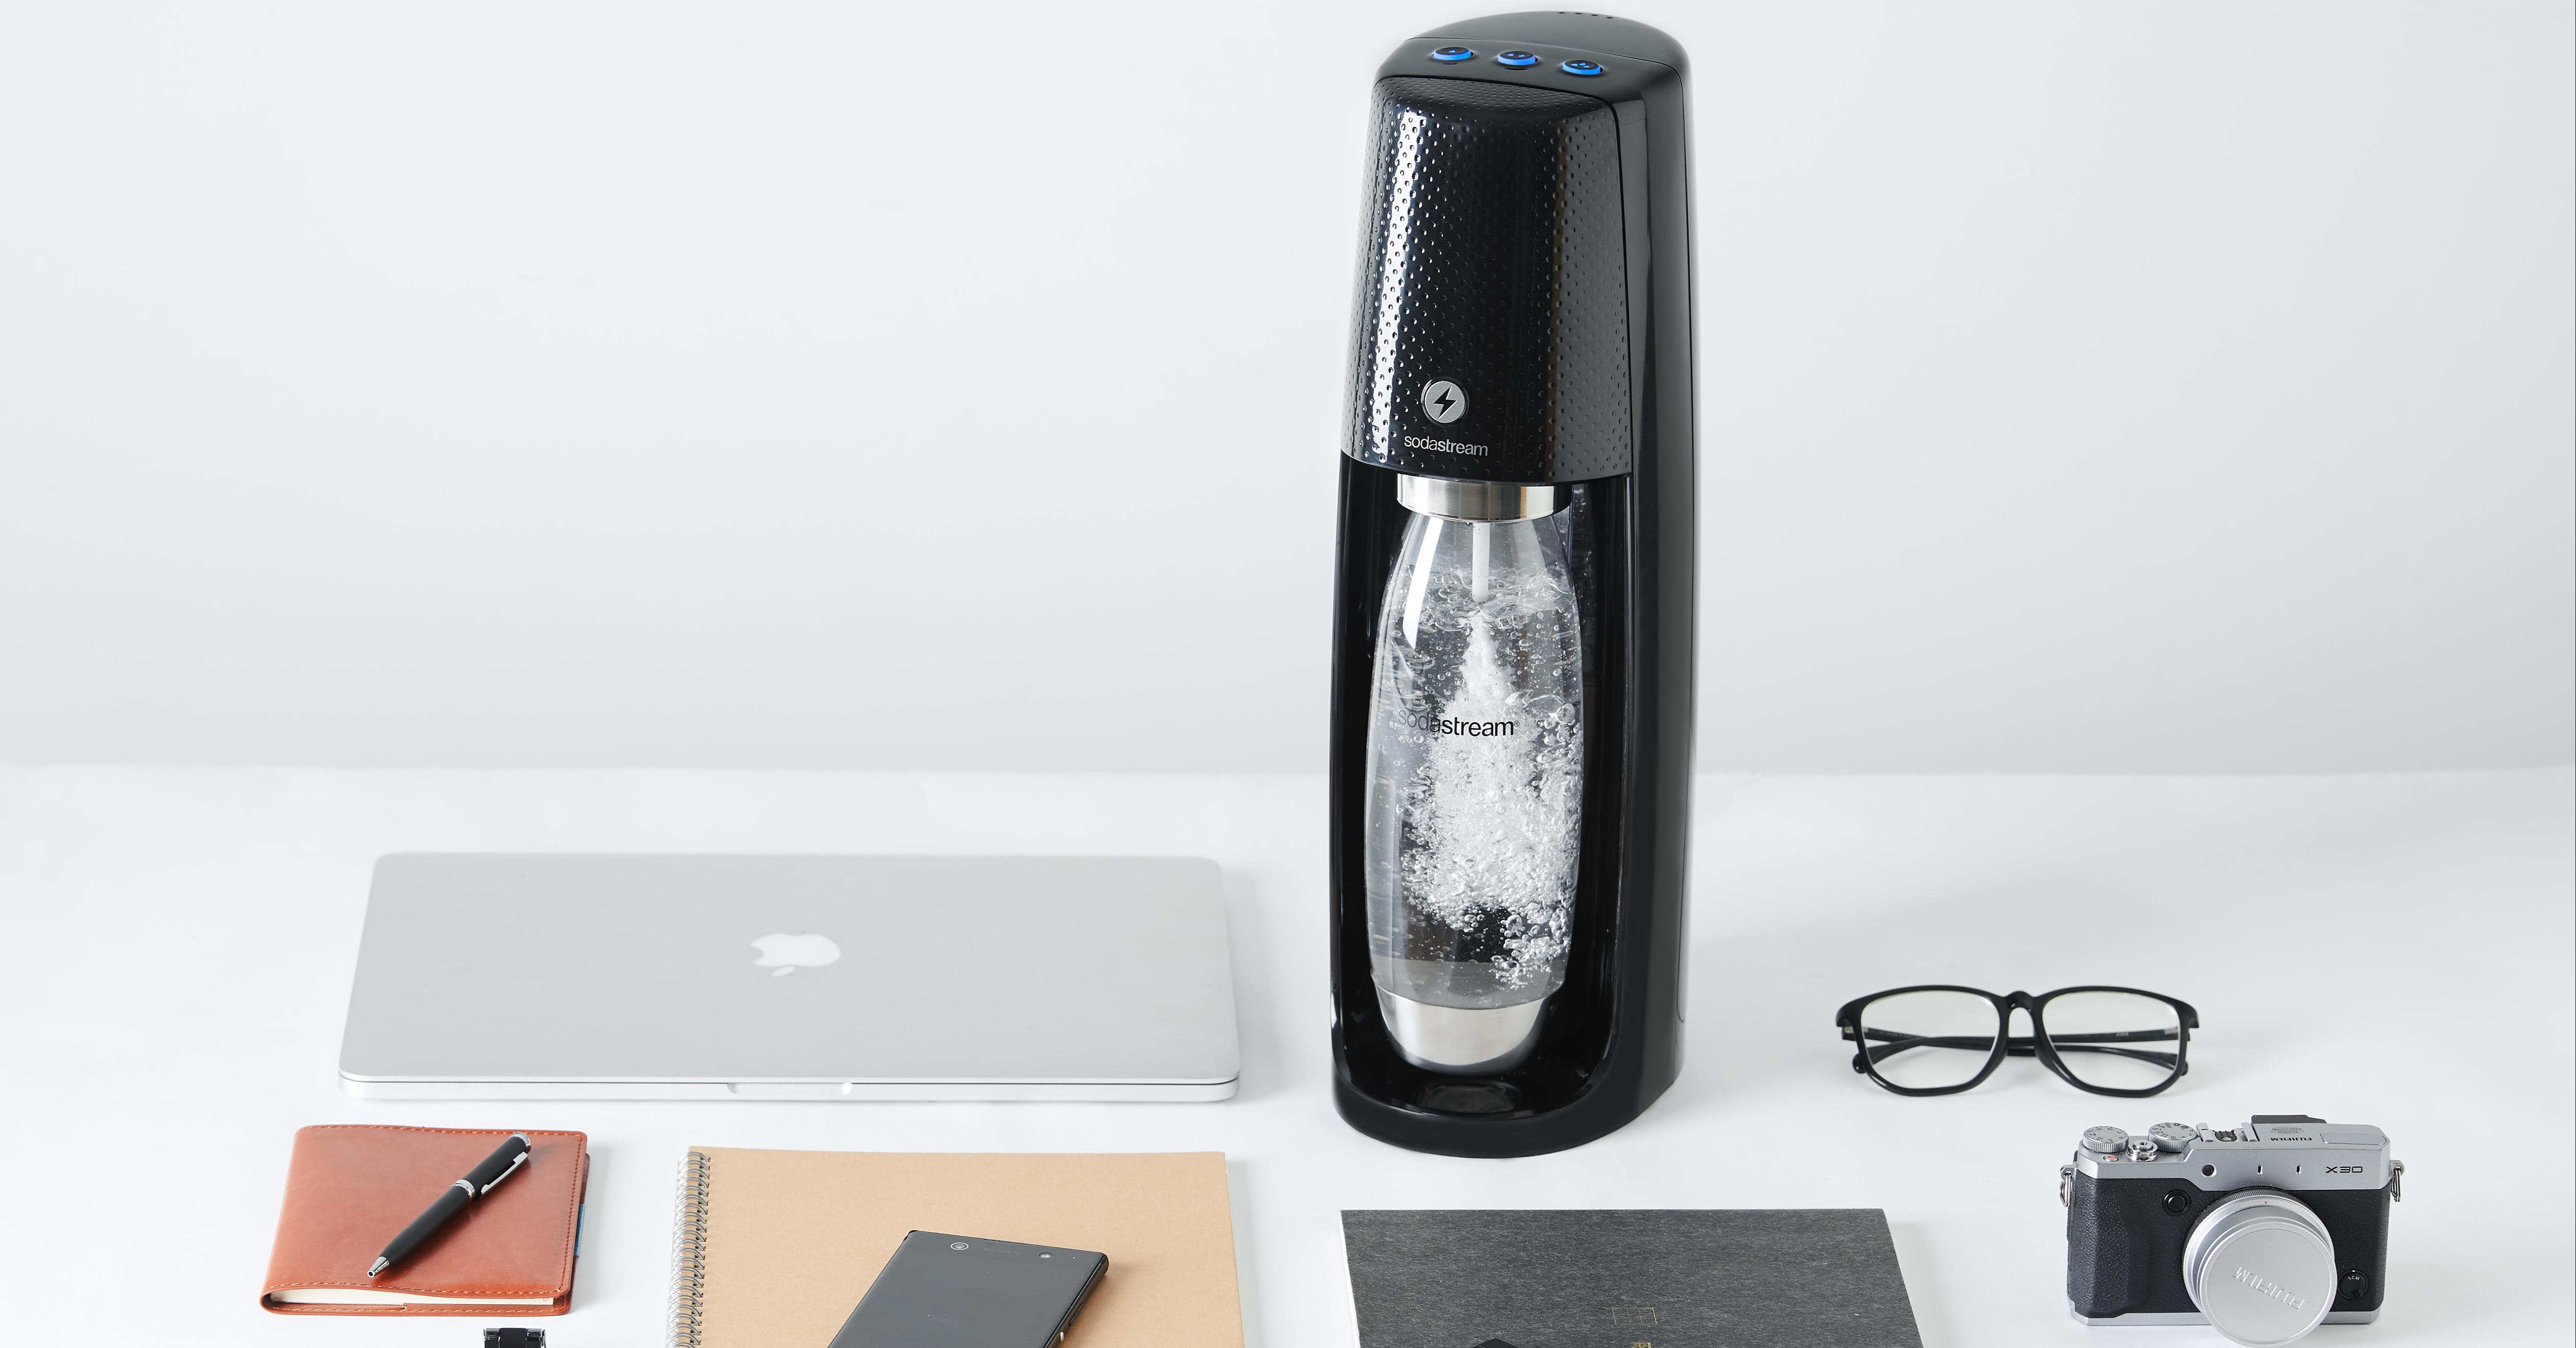 sodastream推出「Spirit One Touch氣泡水機」X「Fruit Drop果香風味飲」,製作自己的專屬氣泡水